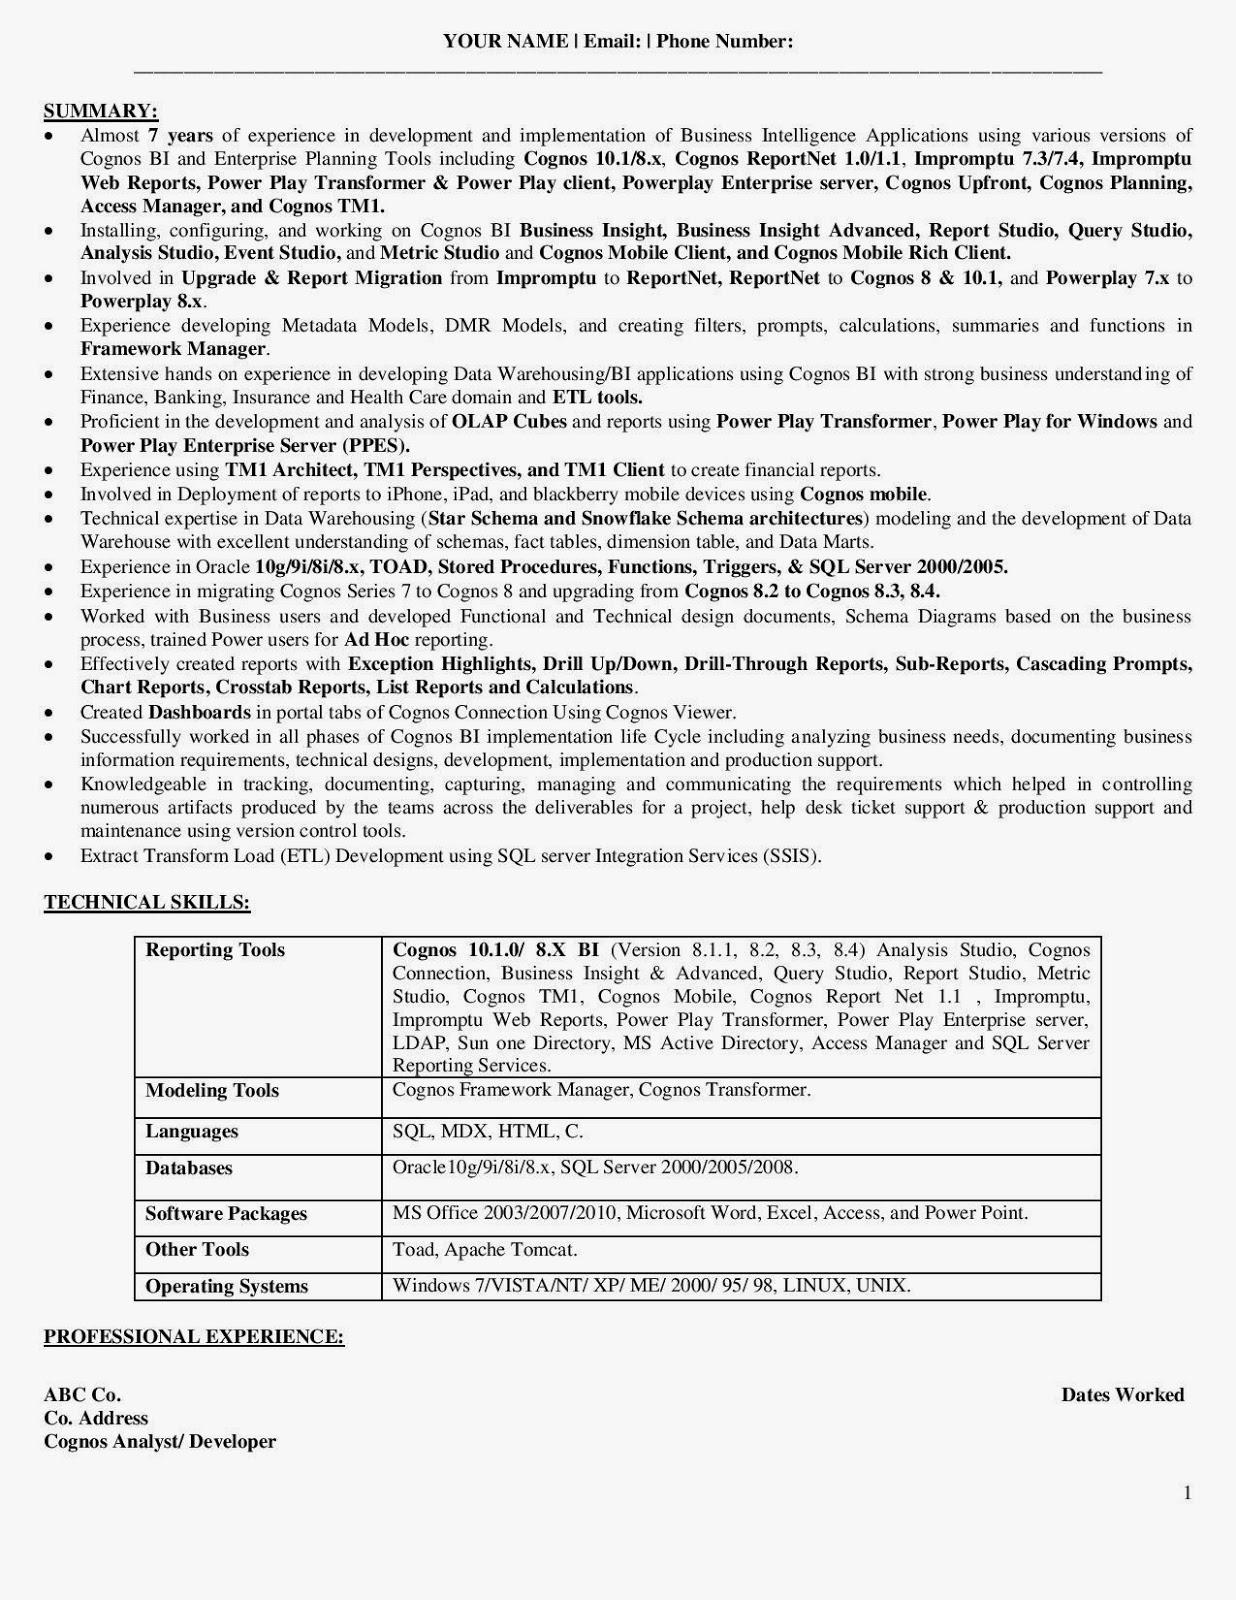 informatica sample resume india